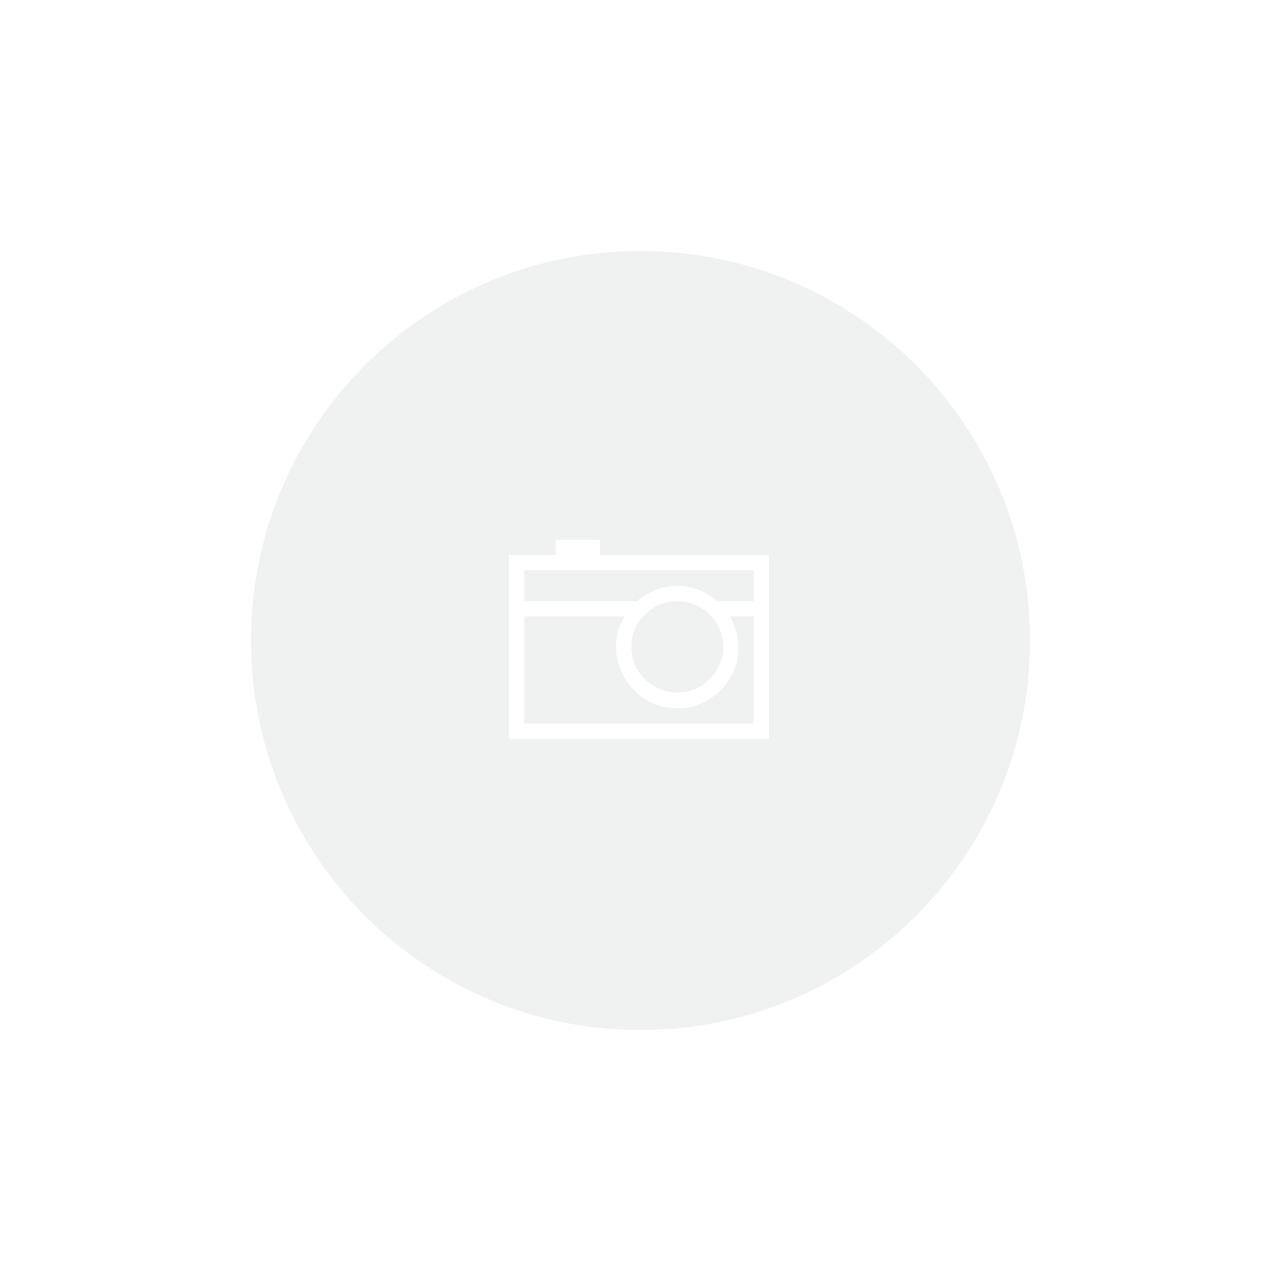 Colher para Chá Ipanema Púrpura Tramontina (Unidade)